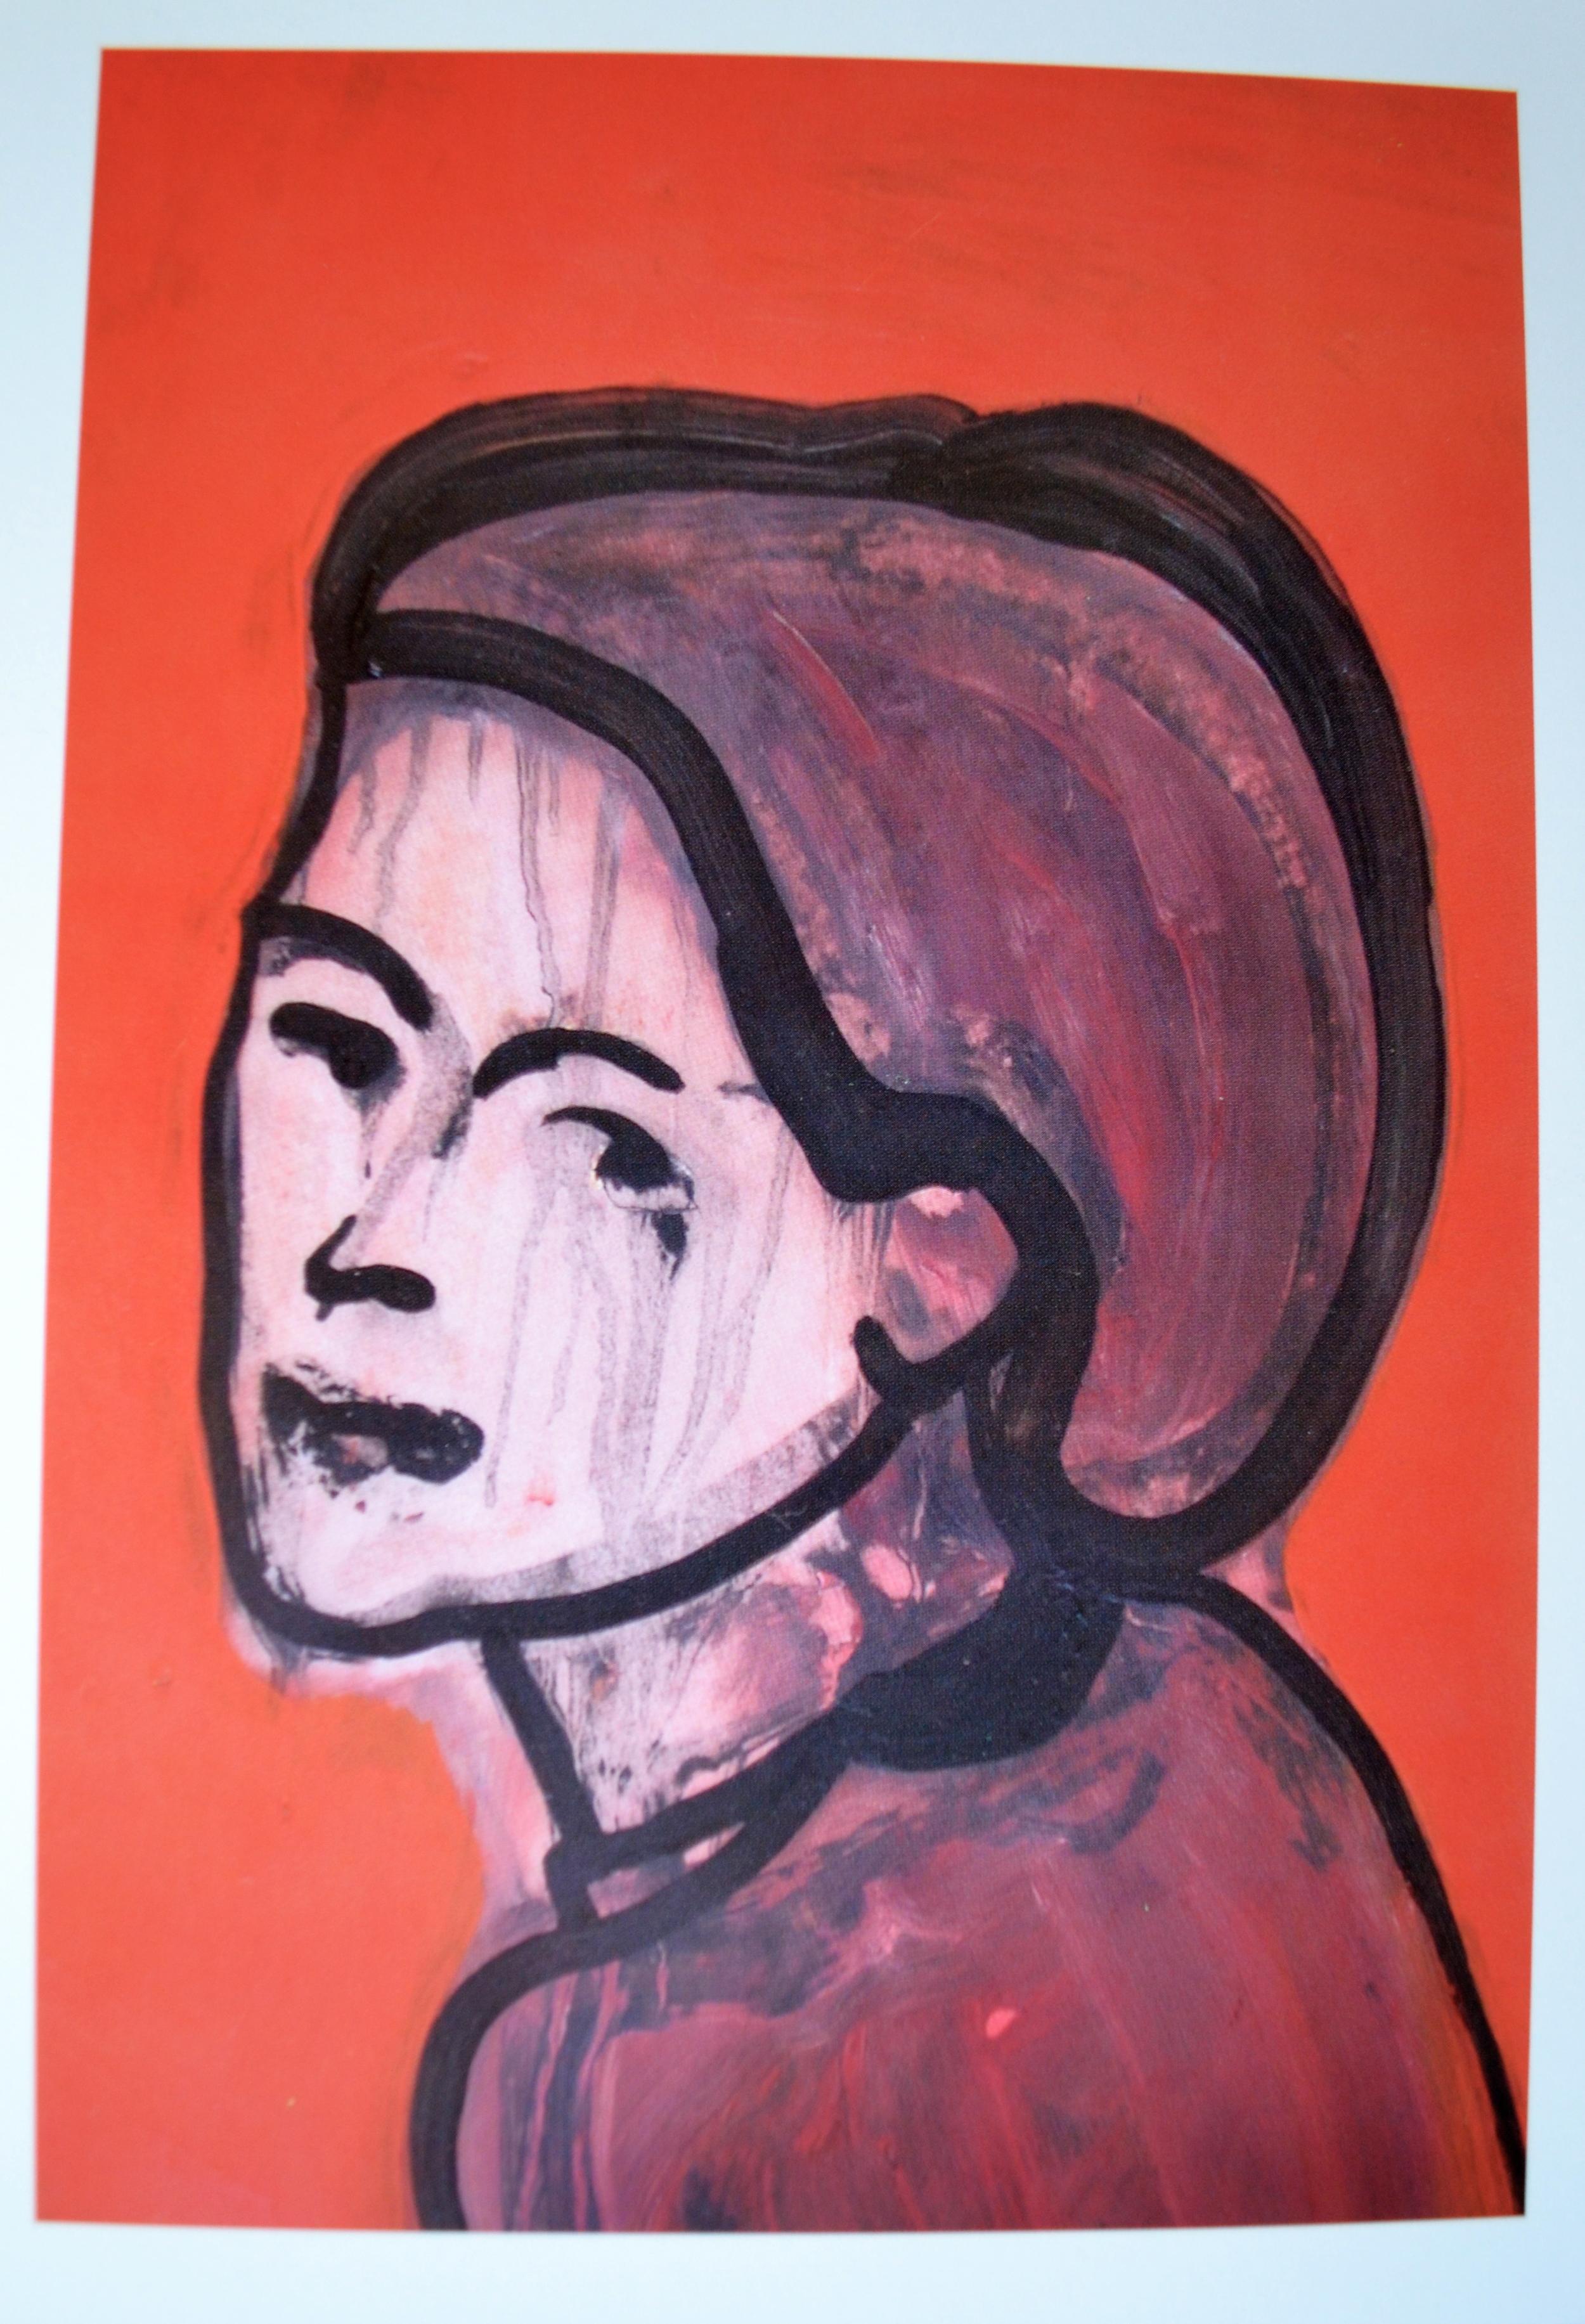 Exhibition 'Shadowline' - Beverley Knowles Fine Art, London 2007